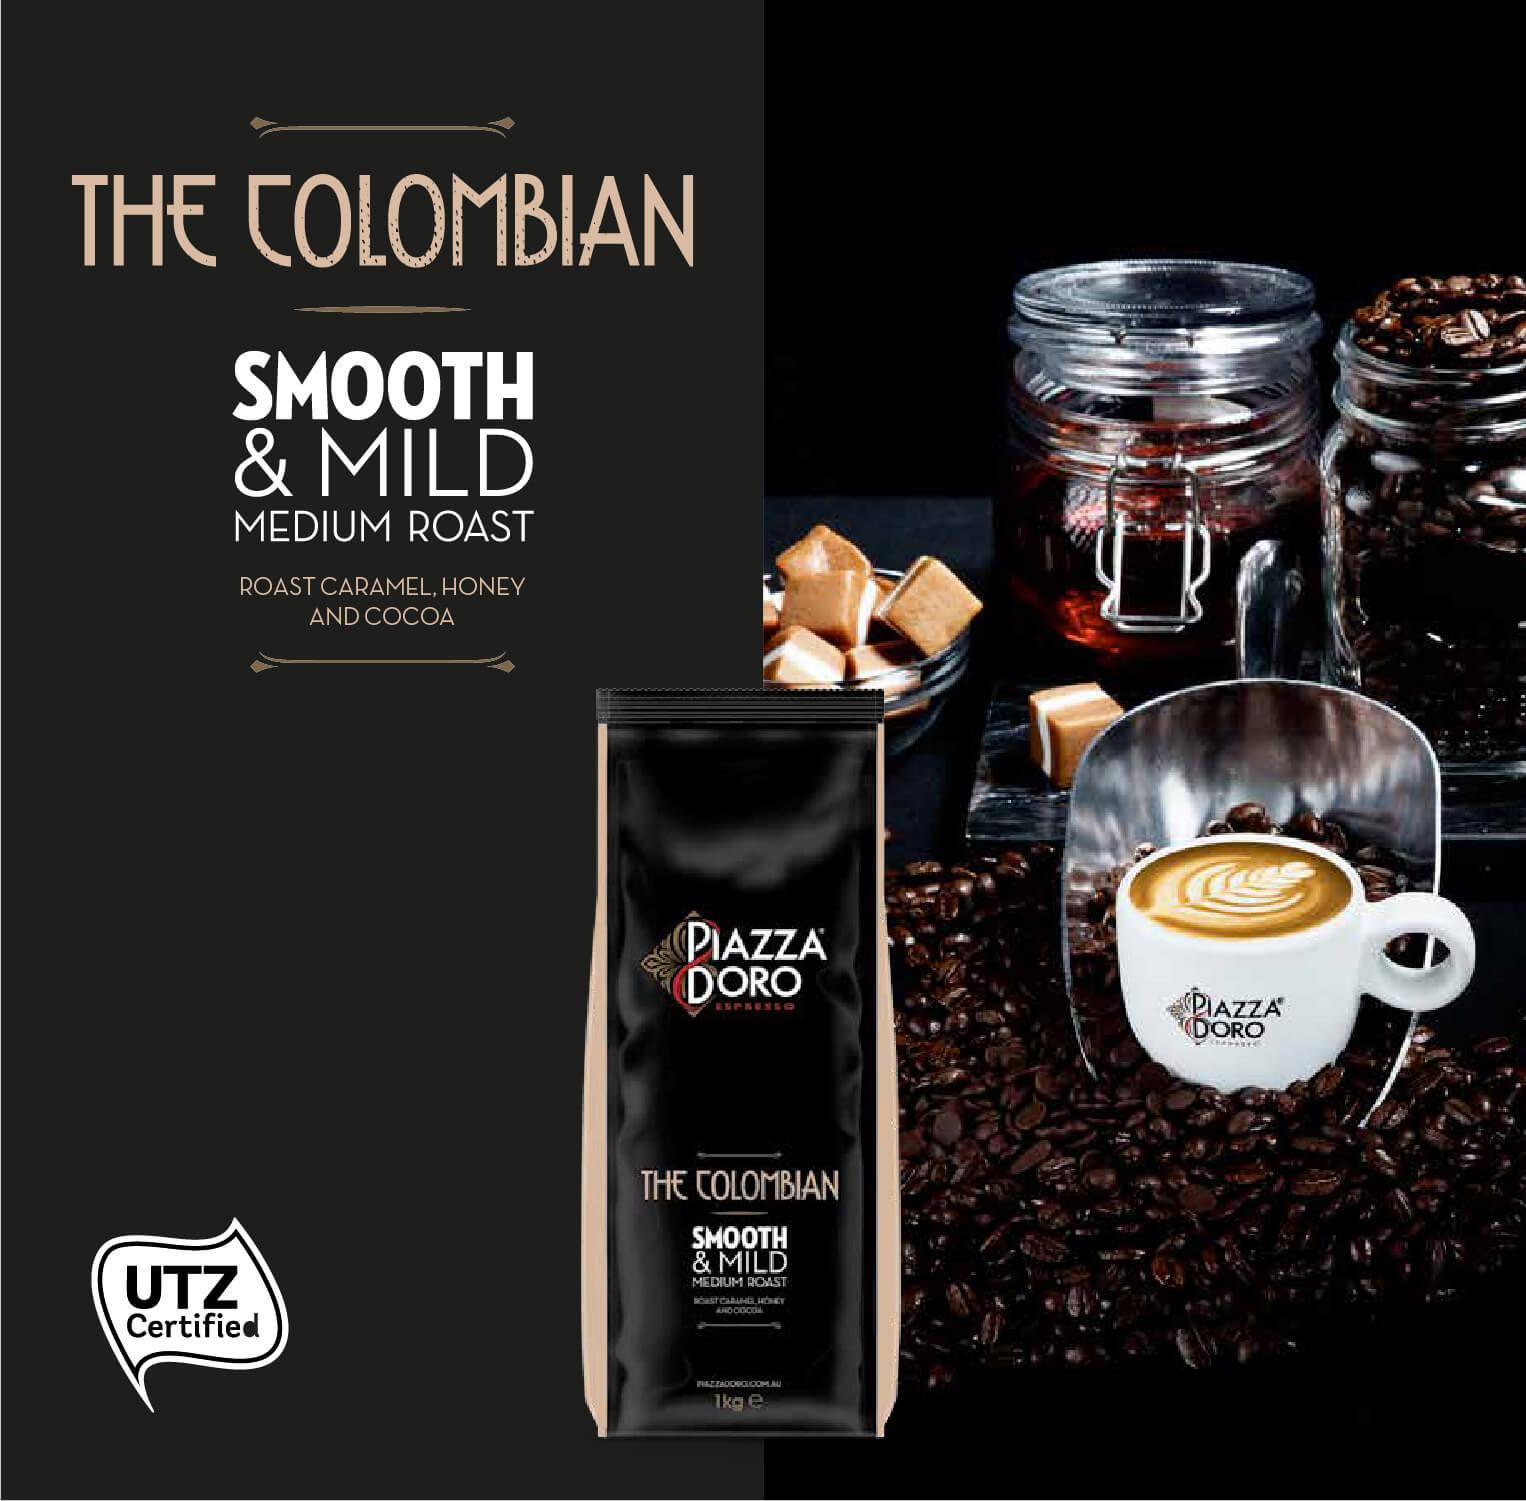 Piazza Doro Coffee Jde Professional